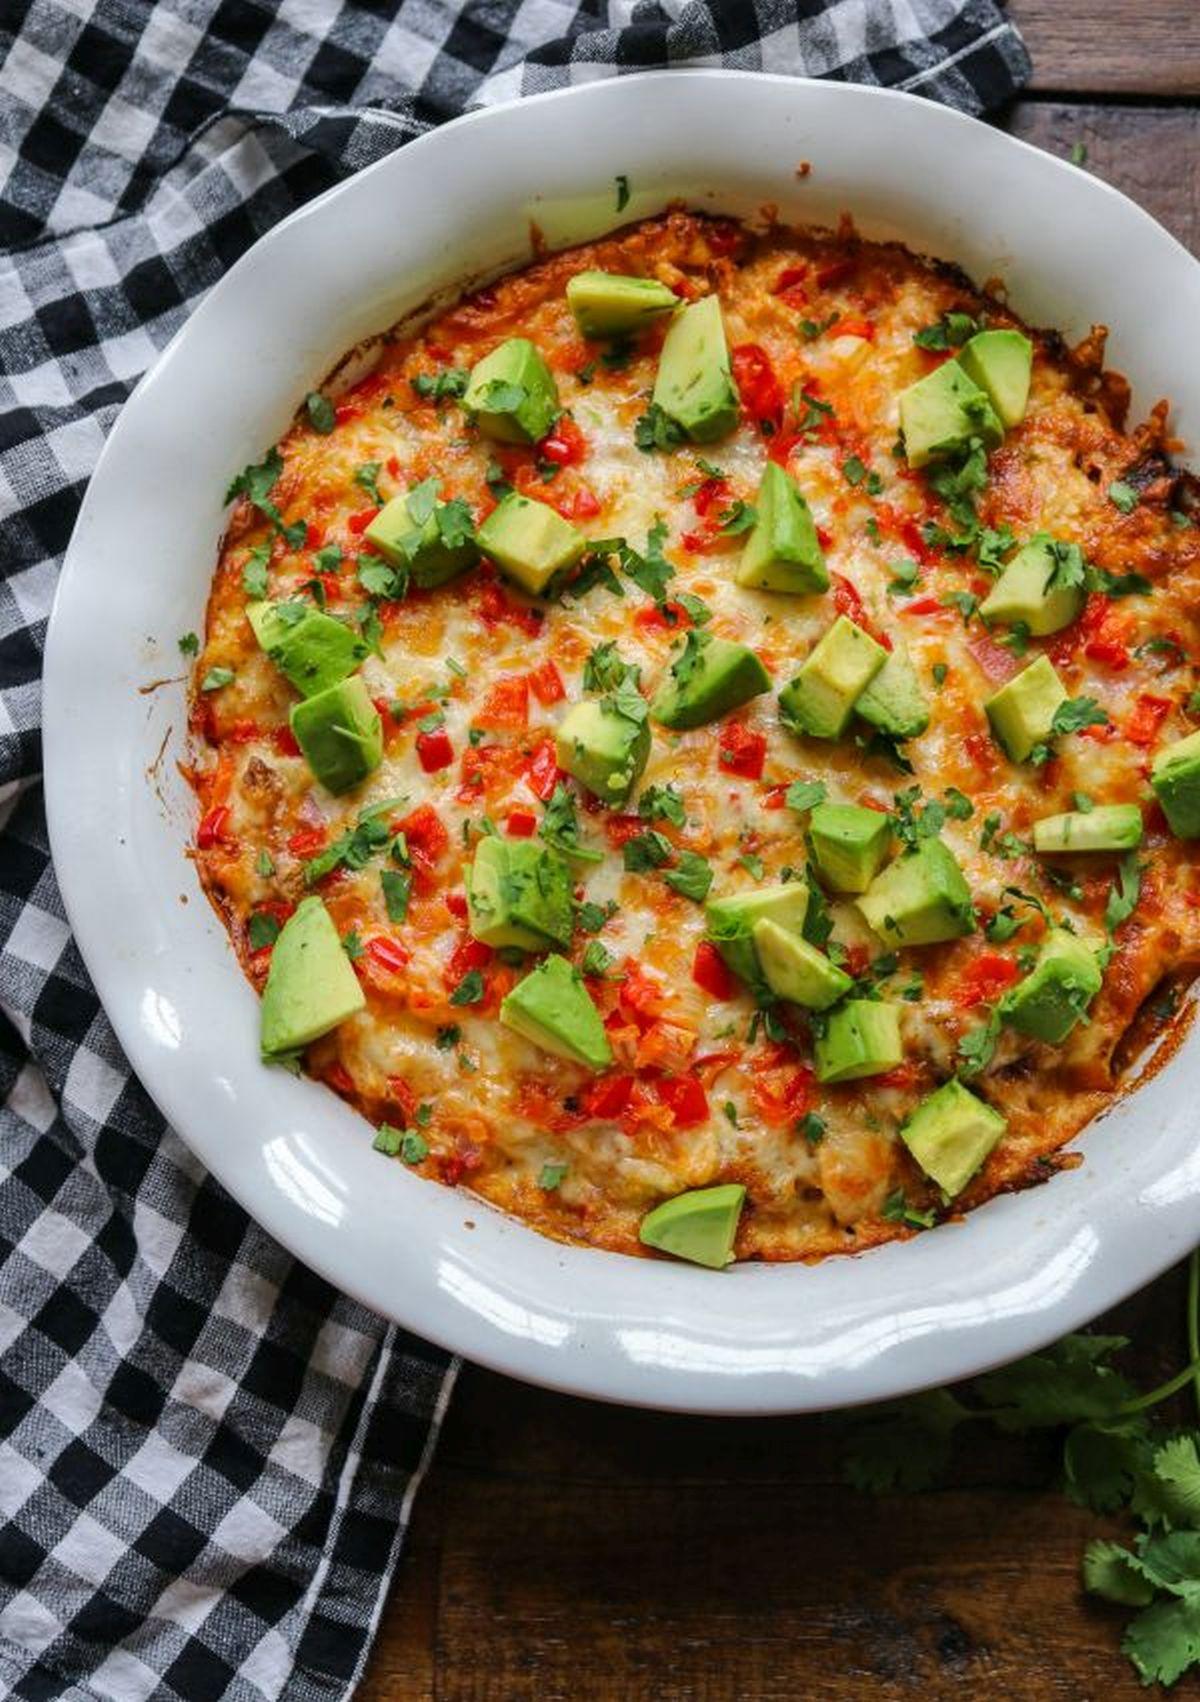 Easy Keto BBQ Chicken Casserole with avocados and cilantro